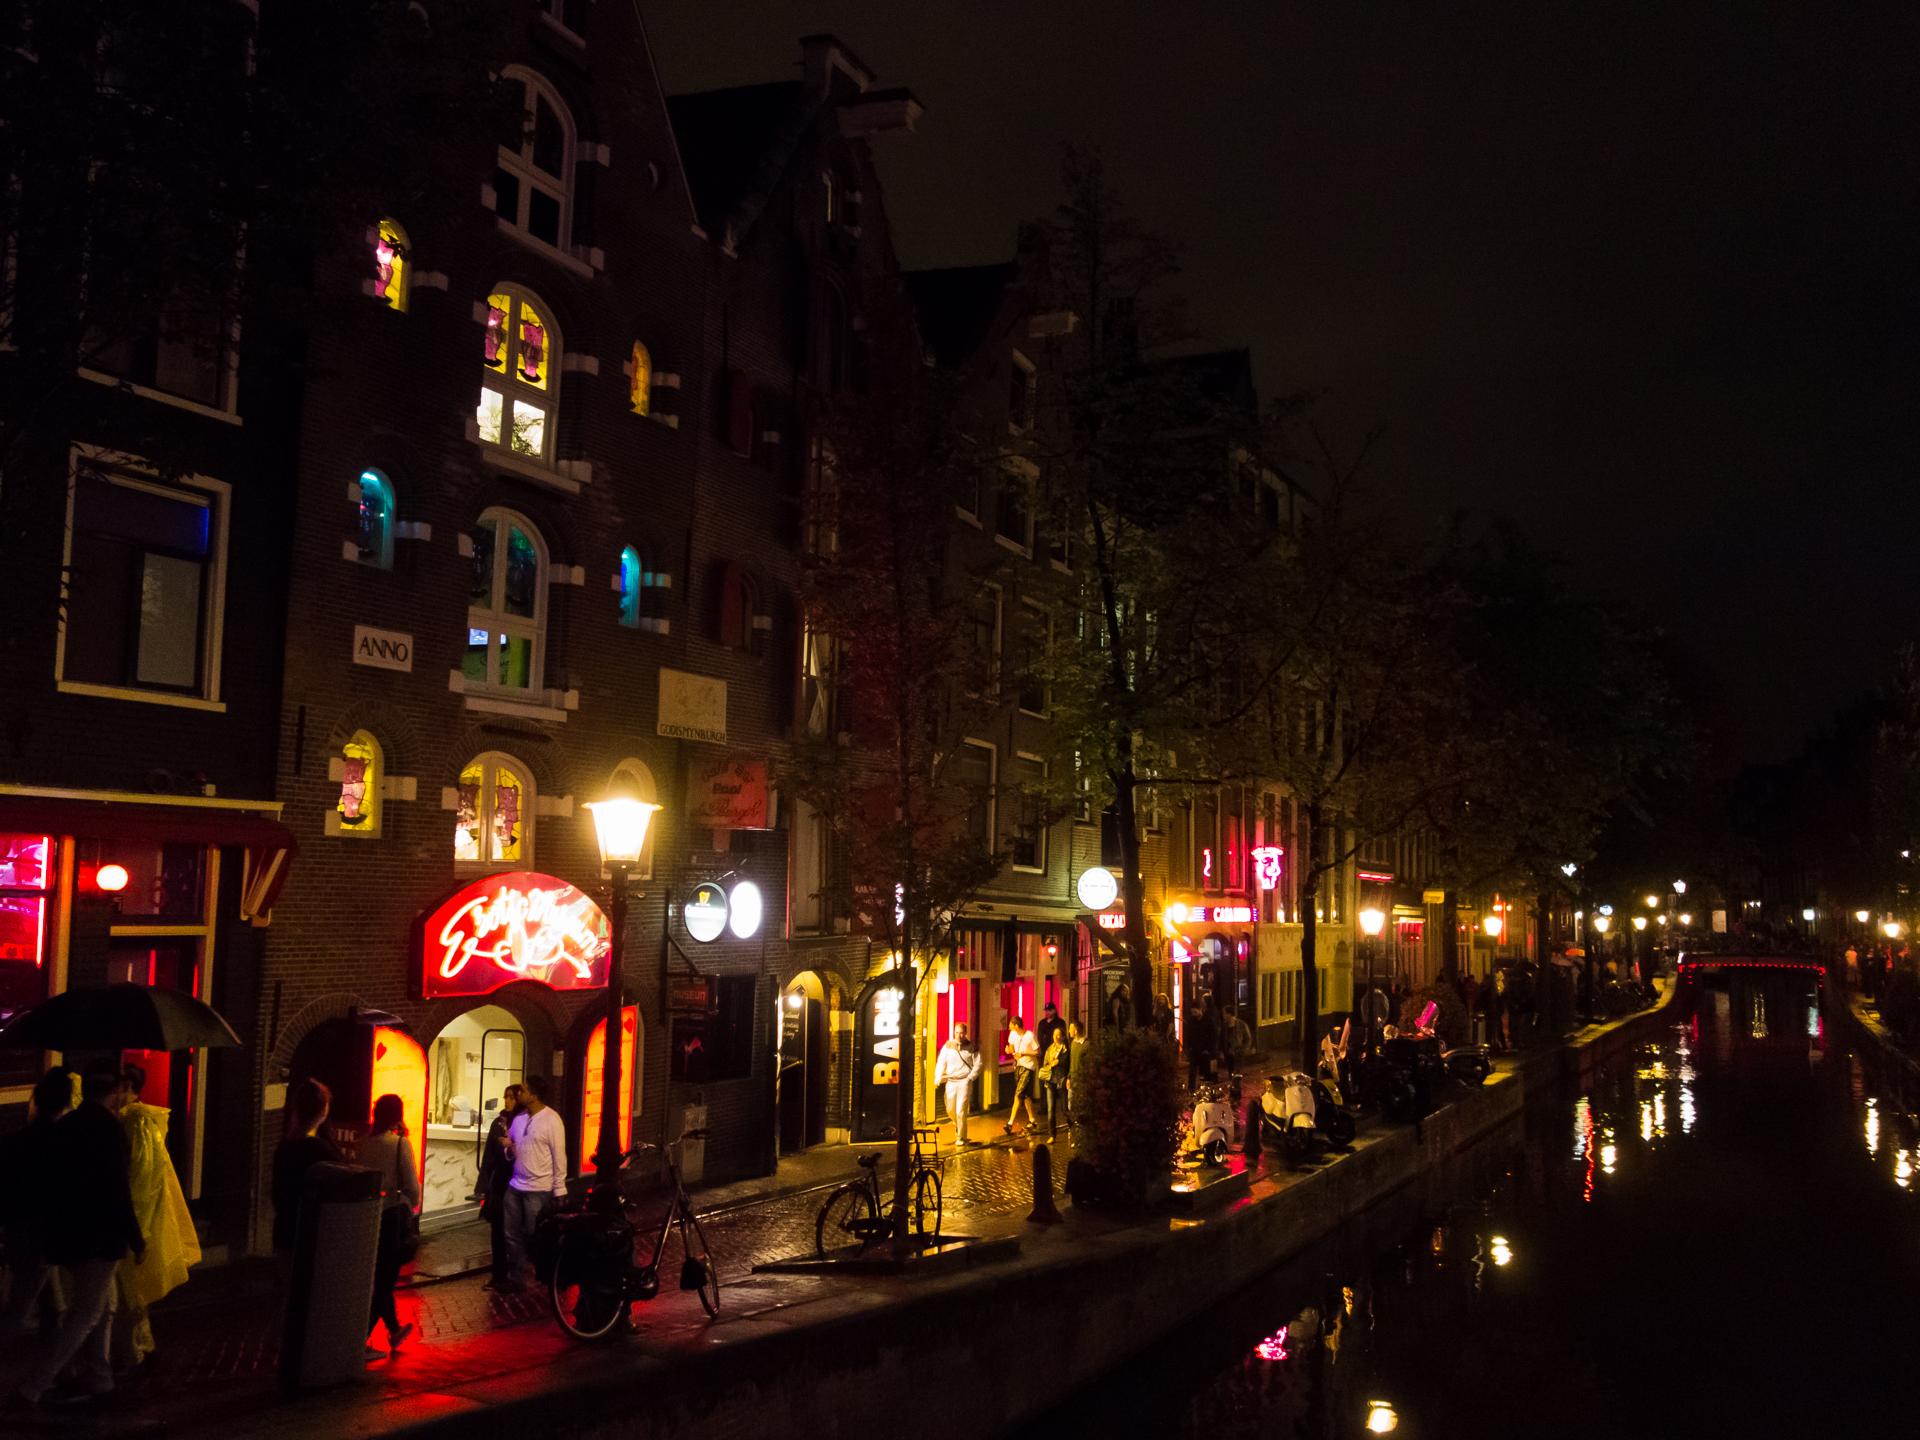 https://get.pxhere.com/photo/light-road-street-night-city-cityscape-downtown-dusk-evening-darkness-lighting-amsterdam-paysbas-metropolis-hollandeseptentrionale-urban-area-human-settlement-417272.jpg